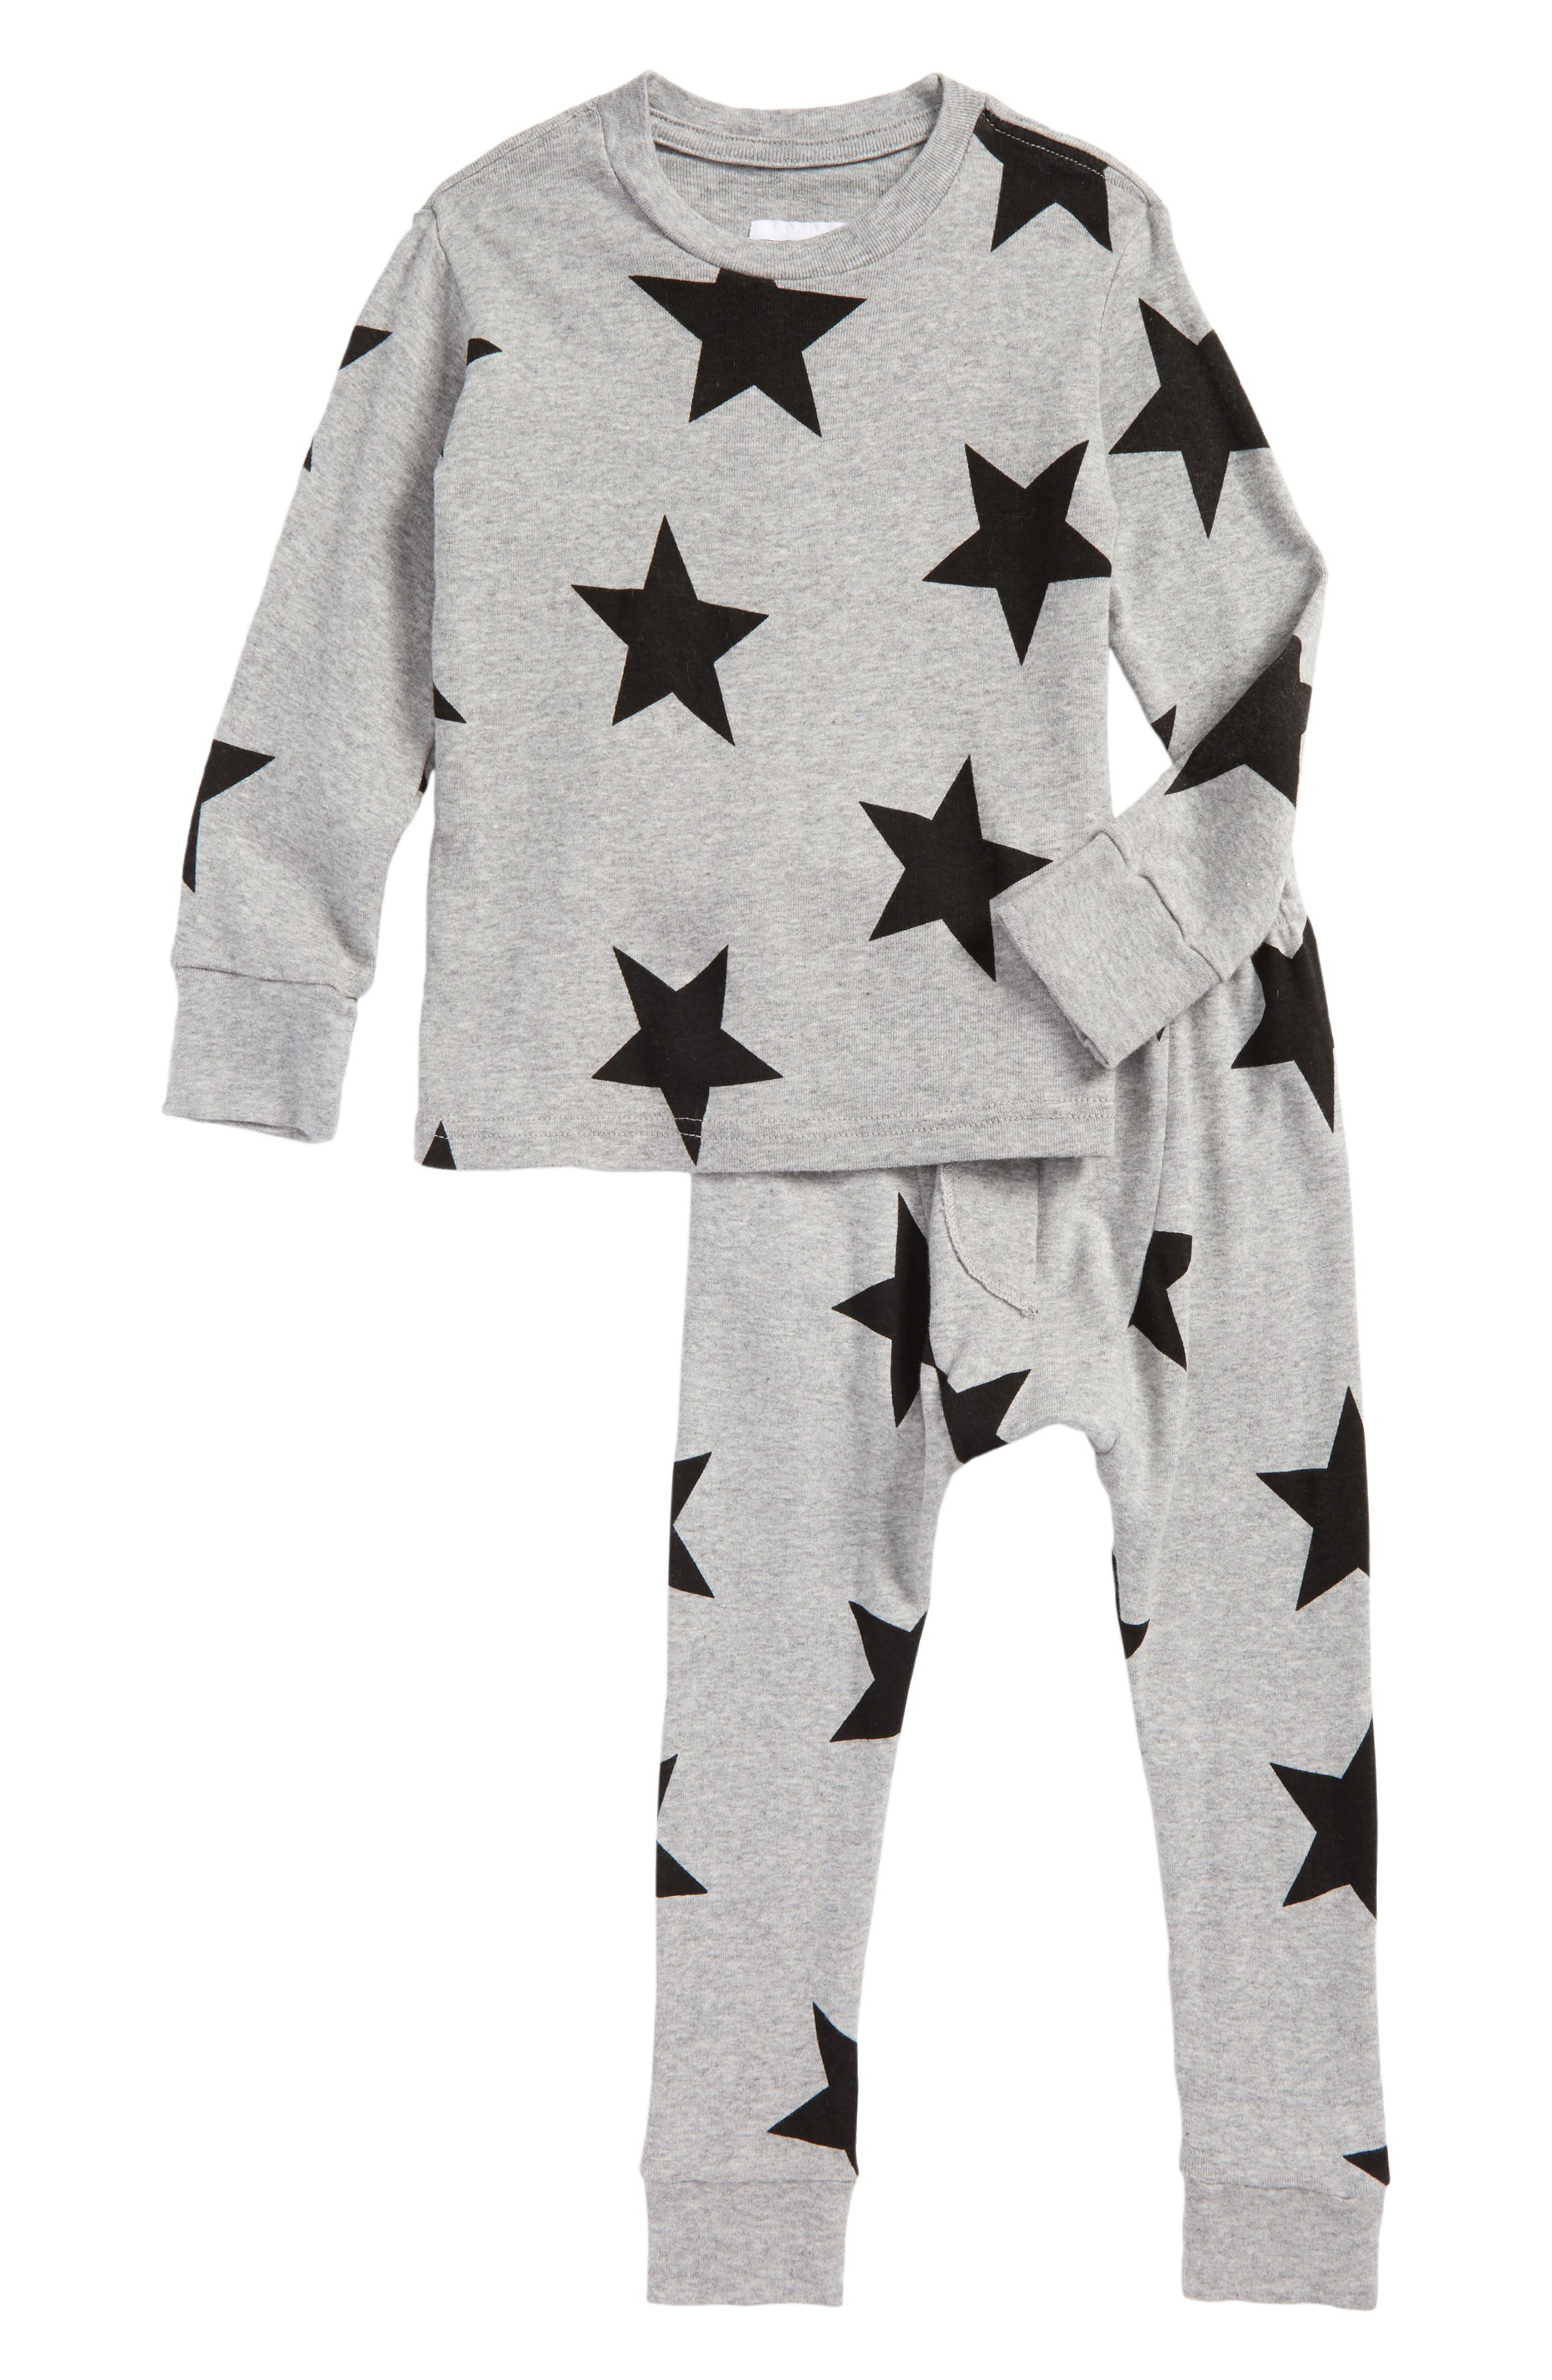 Main Image - NUNUNU Star Print T-Shirt & Pants Set (Toddler Boys & Little Boys)